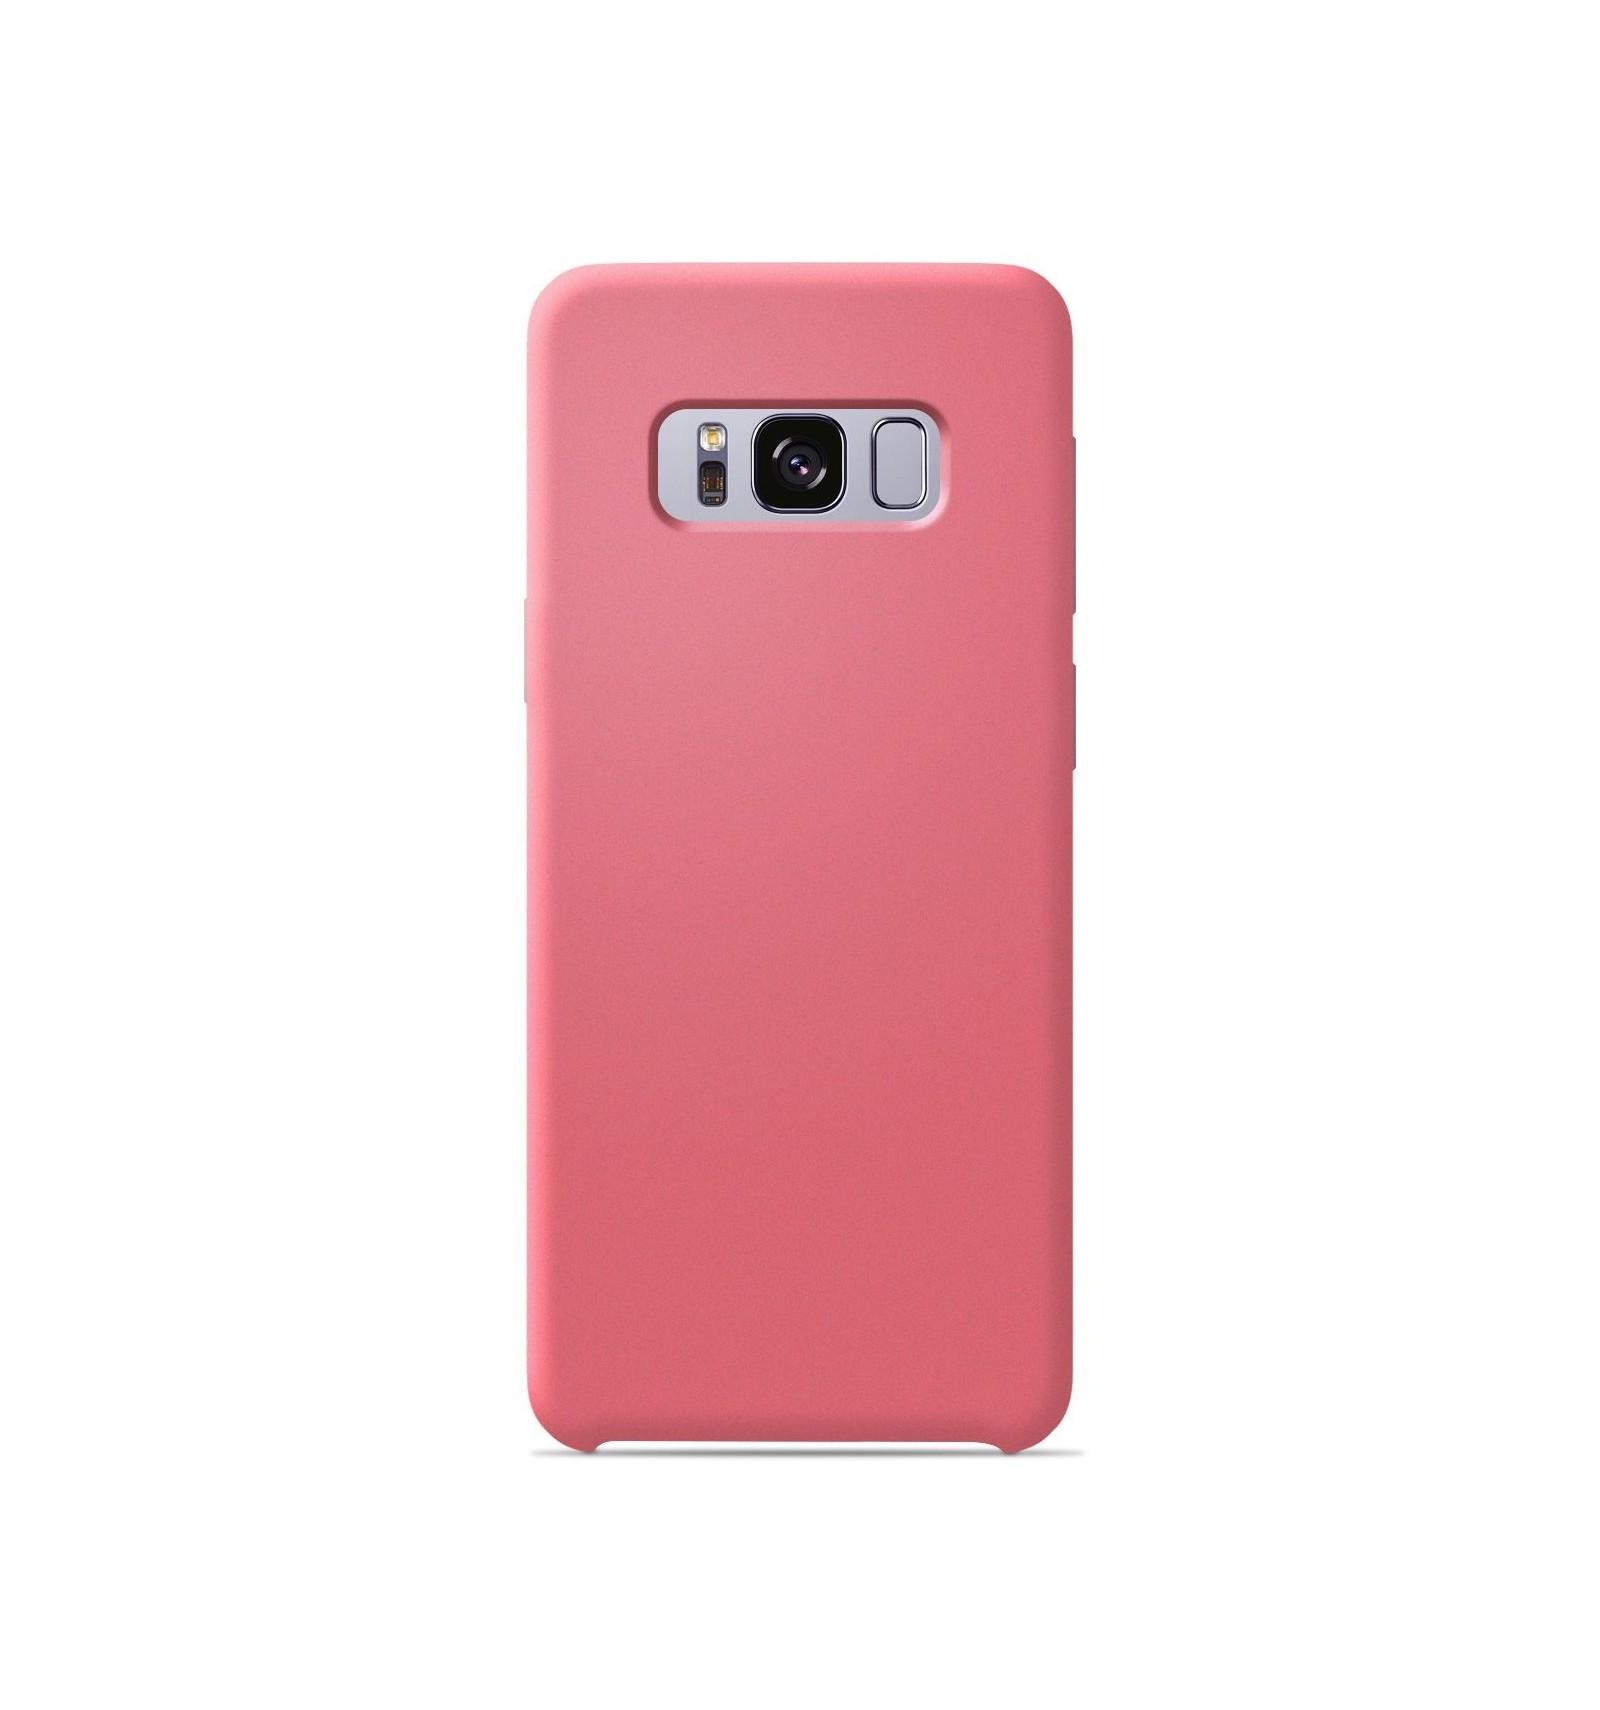 Coque Samsung Galaxy S8 Silicone Soft Touch - Saumon